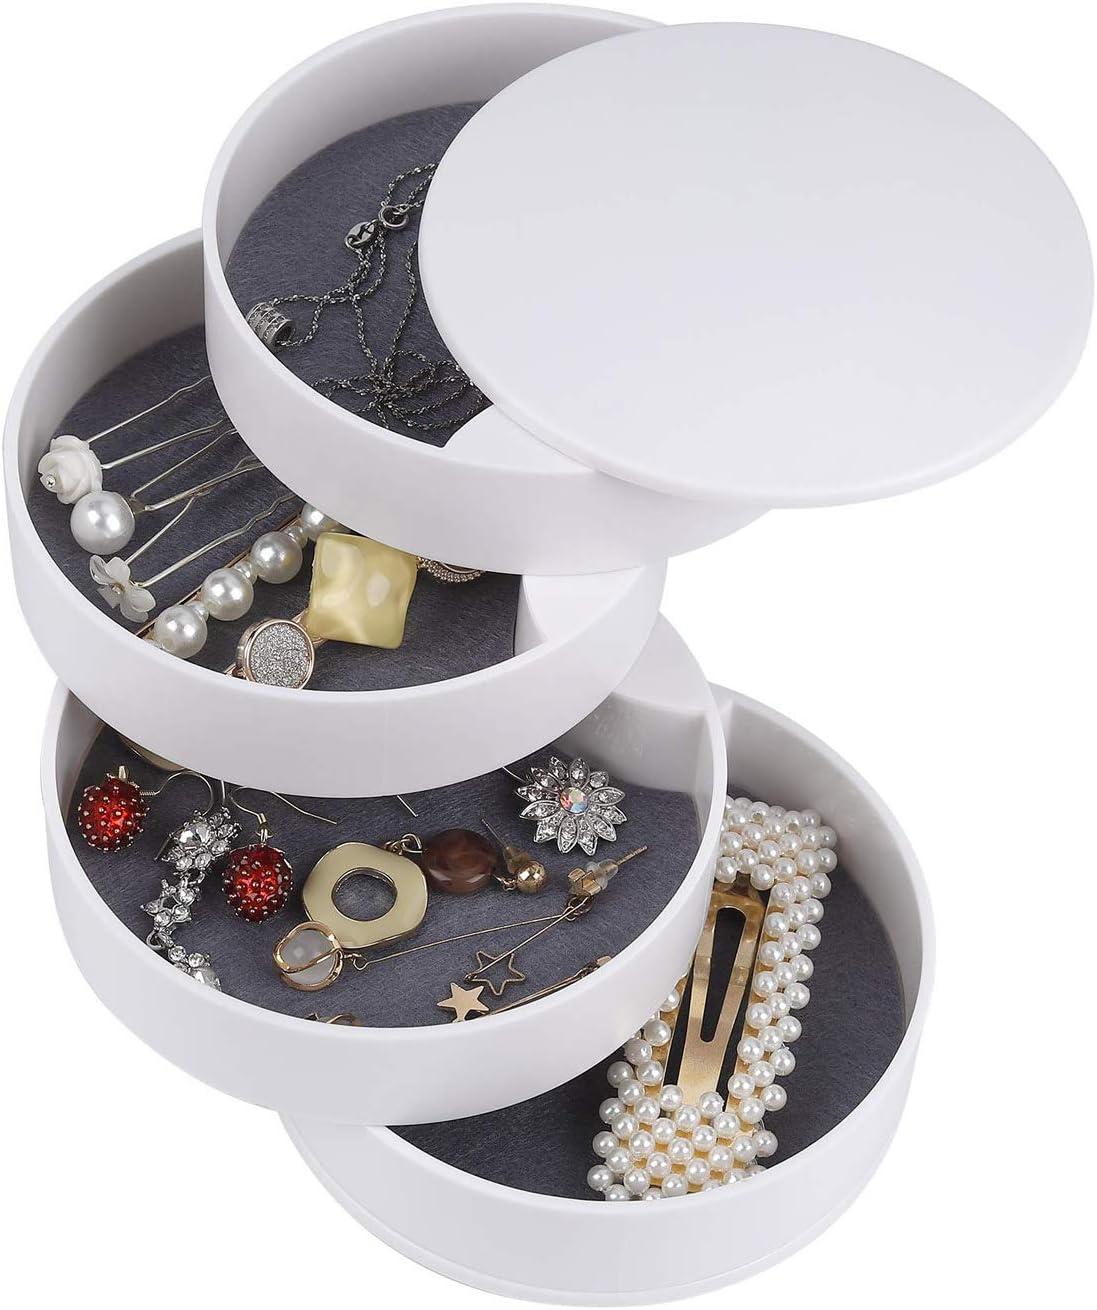 LGYKUMEG Super intense Cheap SALE Start SALE Jewelry Box Jewelcase from Rotation TAVOL 360 Degrees